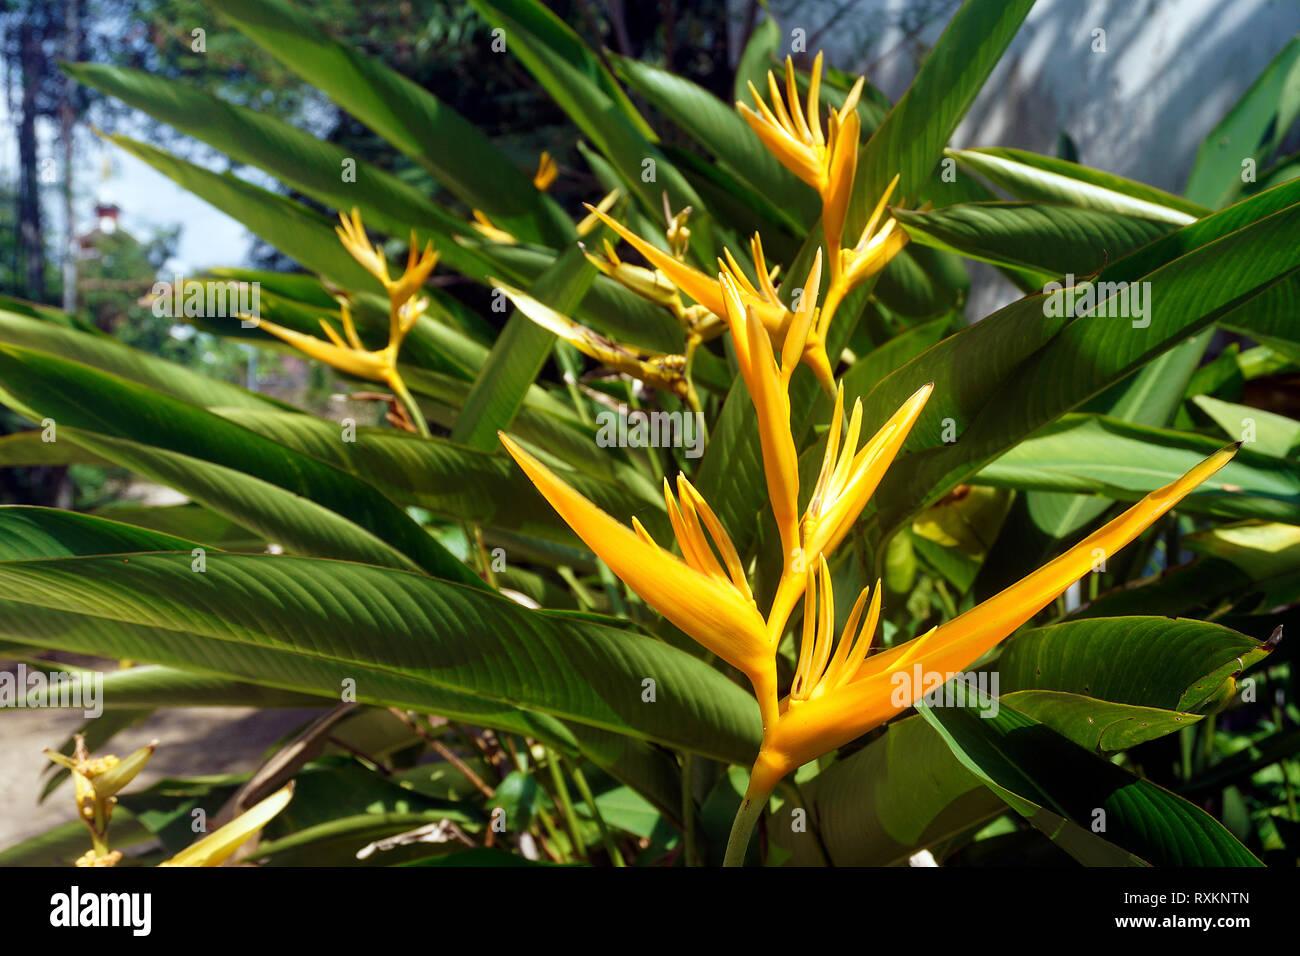 Golden Torch (Heliconia psittacorum x Heliconia spathocircinata), blooming, Koh Samui, Thailand - Stock Image